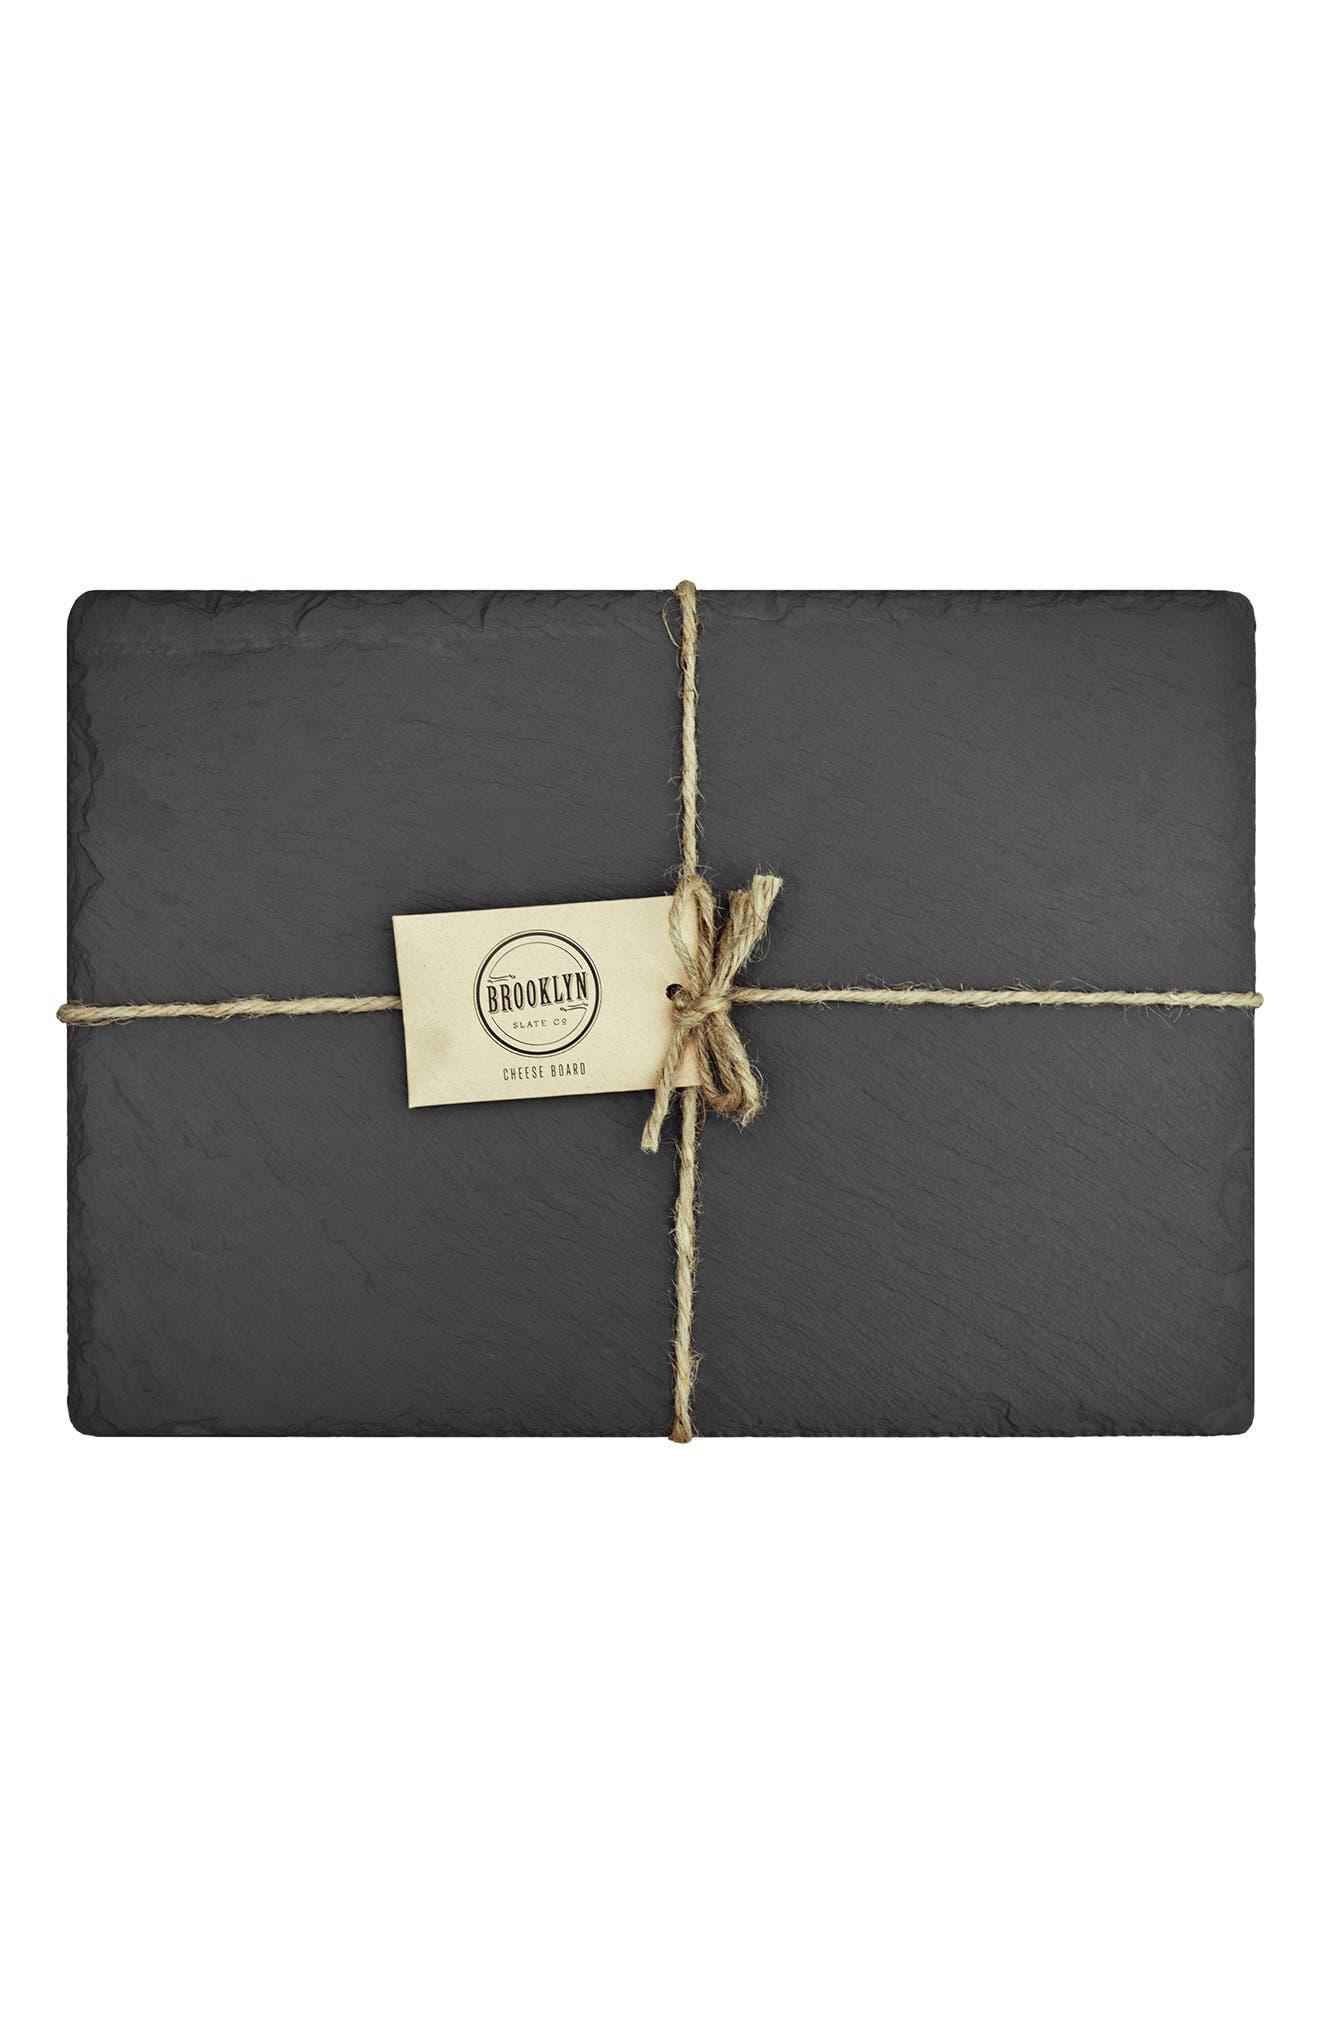 Medium Cheese Board,                             Alternate thumbnail 2, color,